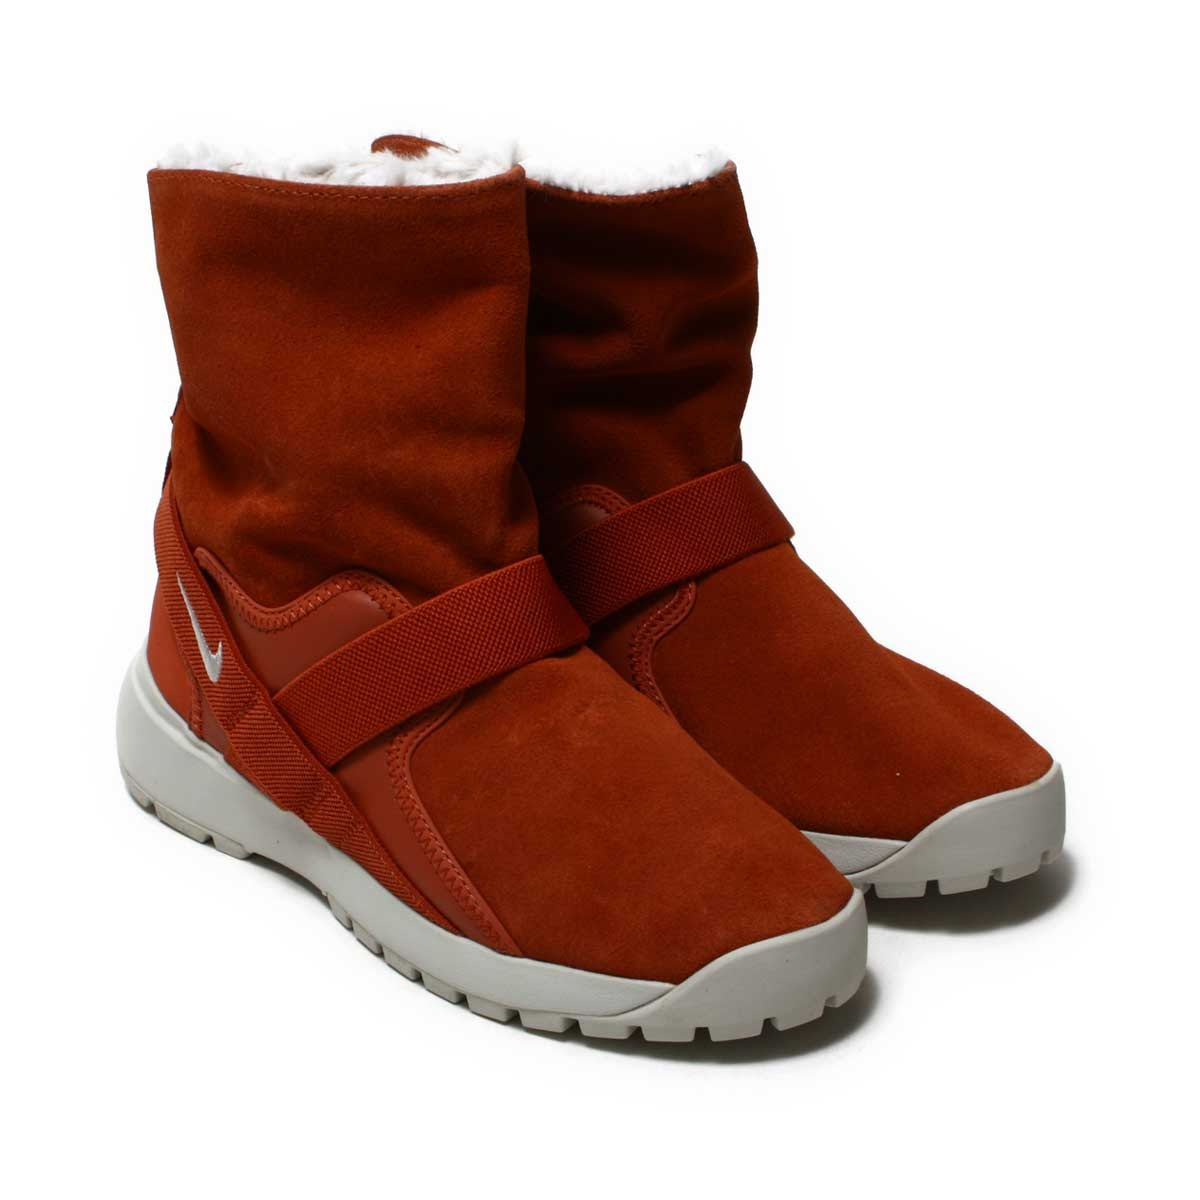 88fc66358de atmos pink  NIKE WMNS GOLKANA BOOT (Nike women GOLKANA boots) DUSTY ...